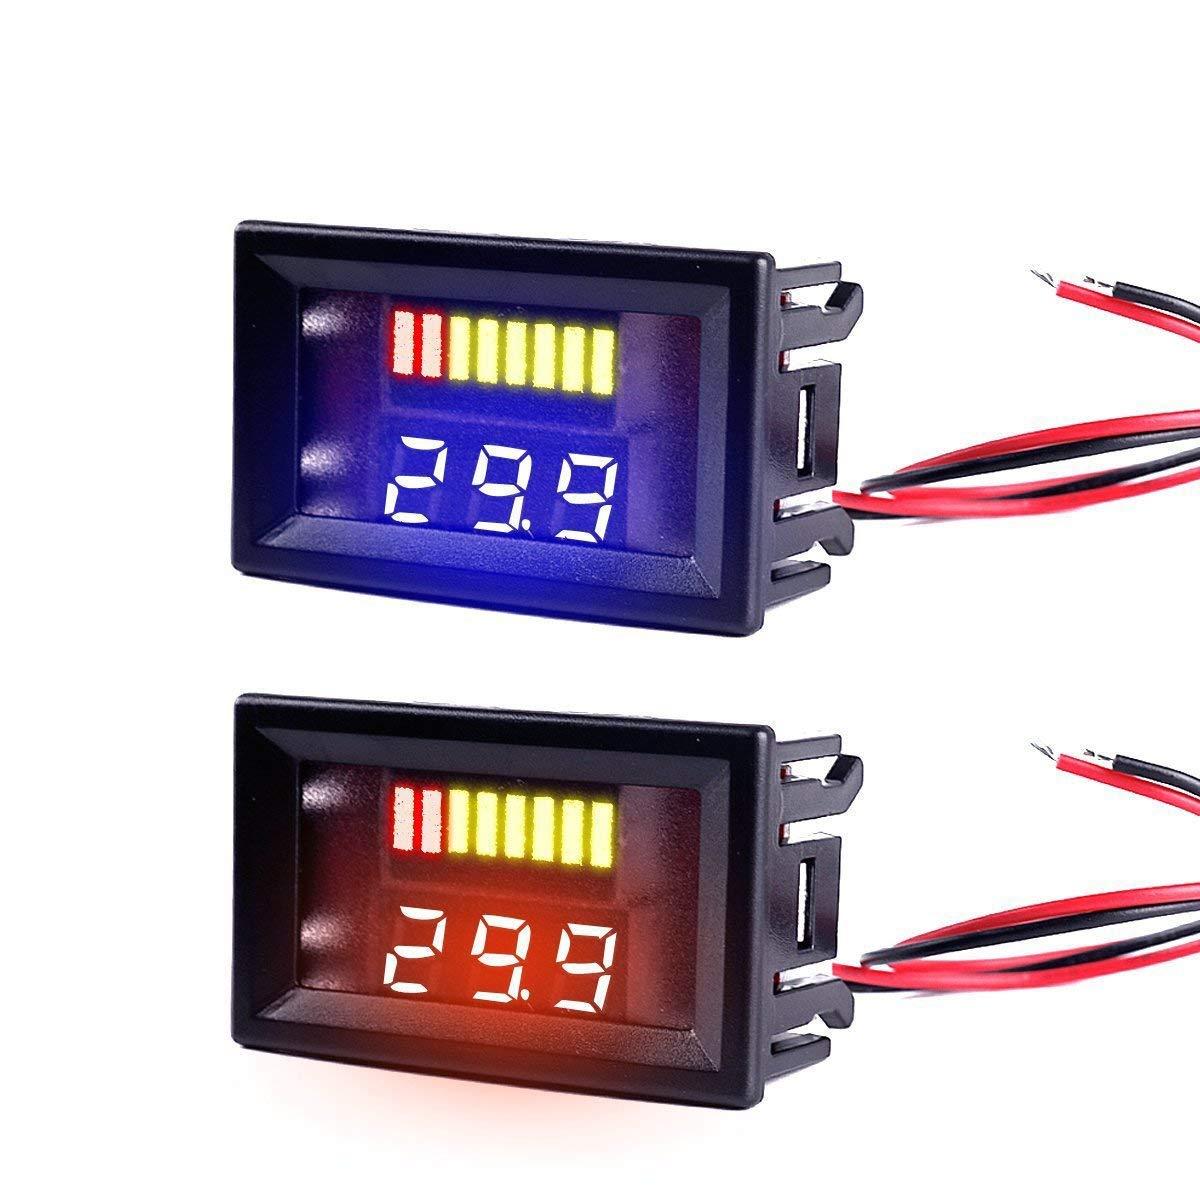 MakerHawk 4pcs Digital DC Voltmeter 0.56 Inch Two-Lines 2.5-30V Digital Voltmeter Gauge Tester LED Display Reverse Polarity Protection and Accurate Pressure Measurement 4 Colours